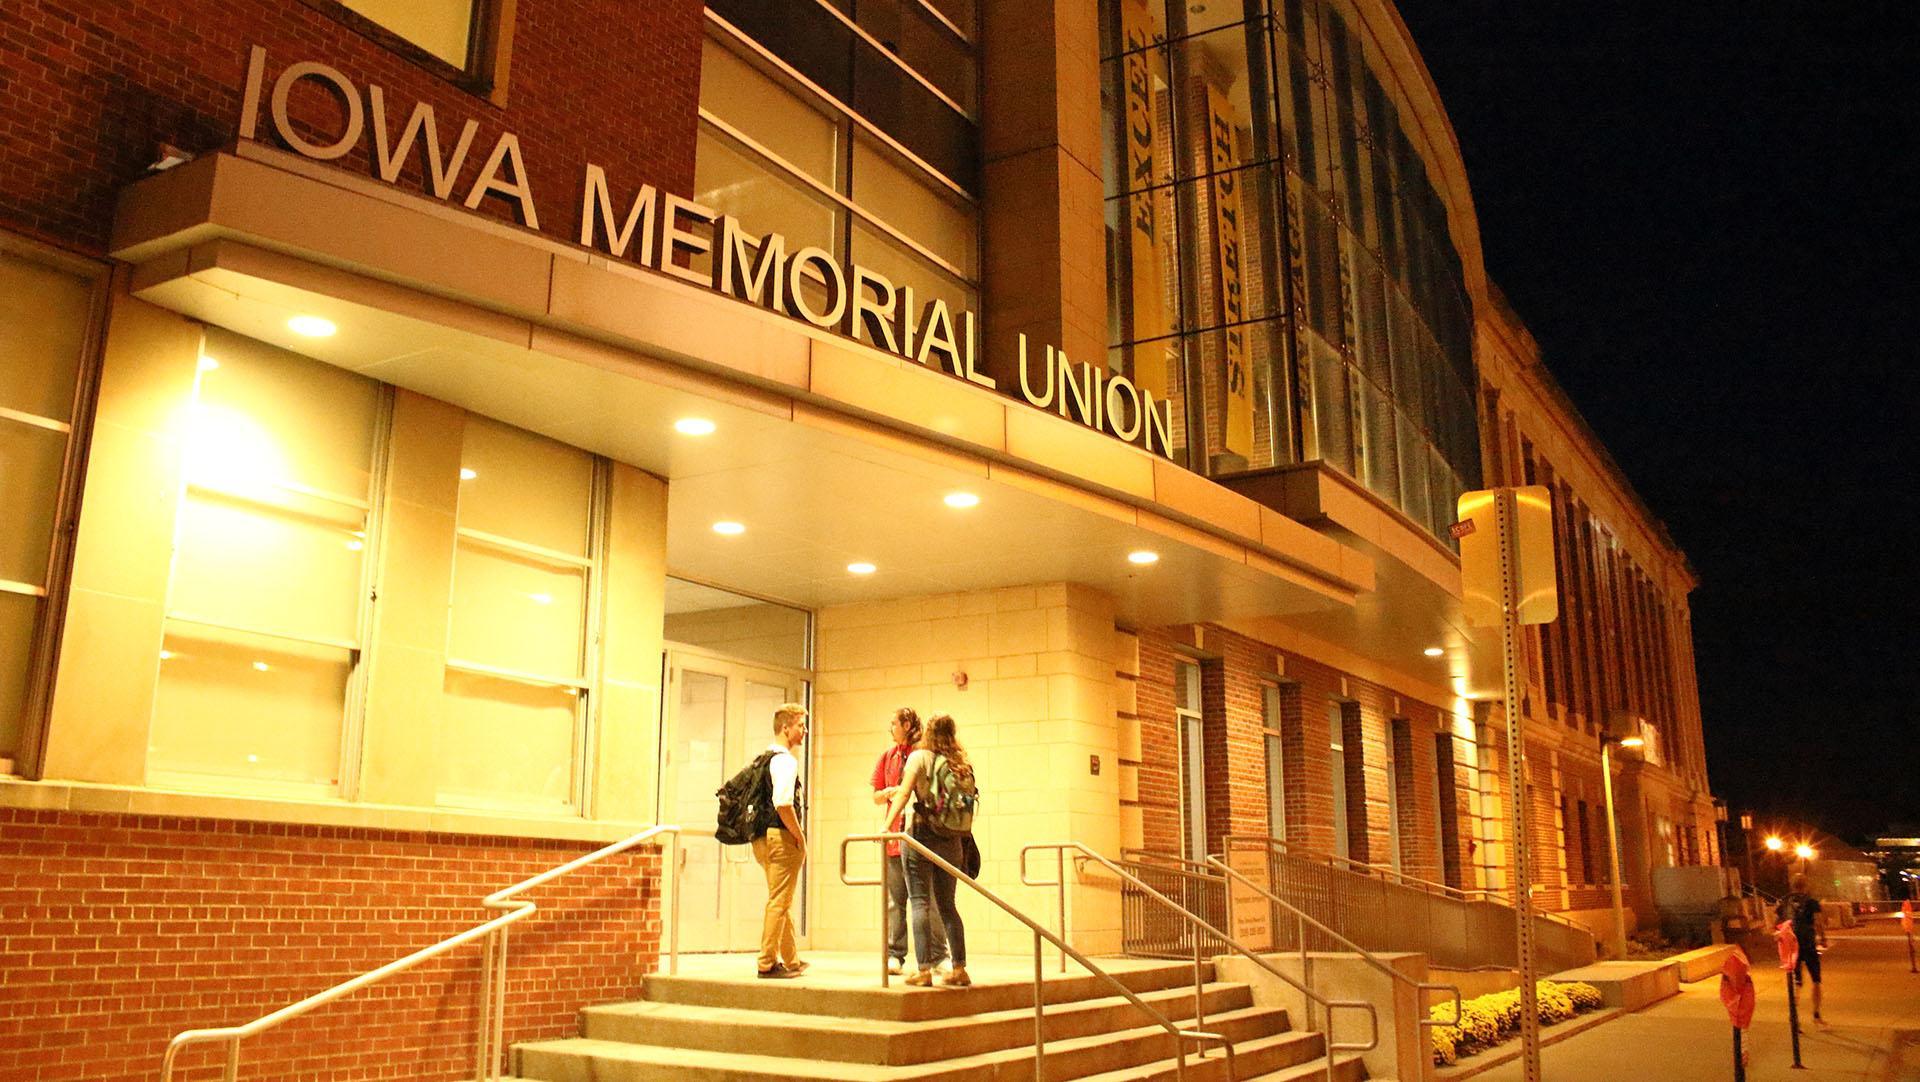 The Iowa Memorial Union as seen Monday, Oct. 9th 2017. (Ashley Morris/The Daily Iowan)